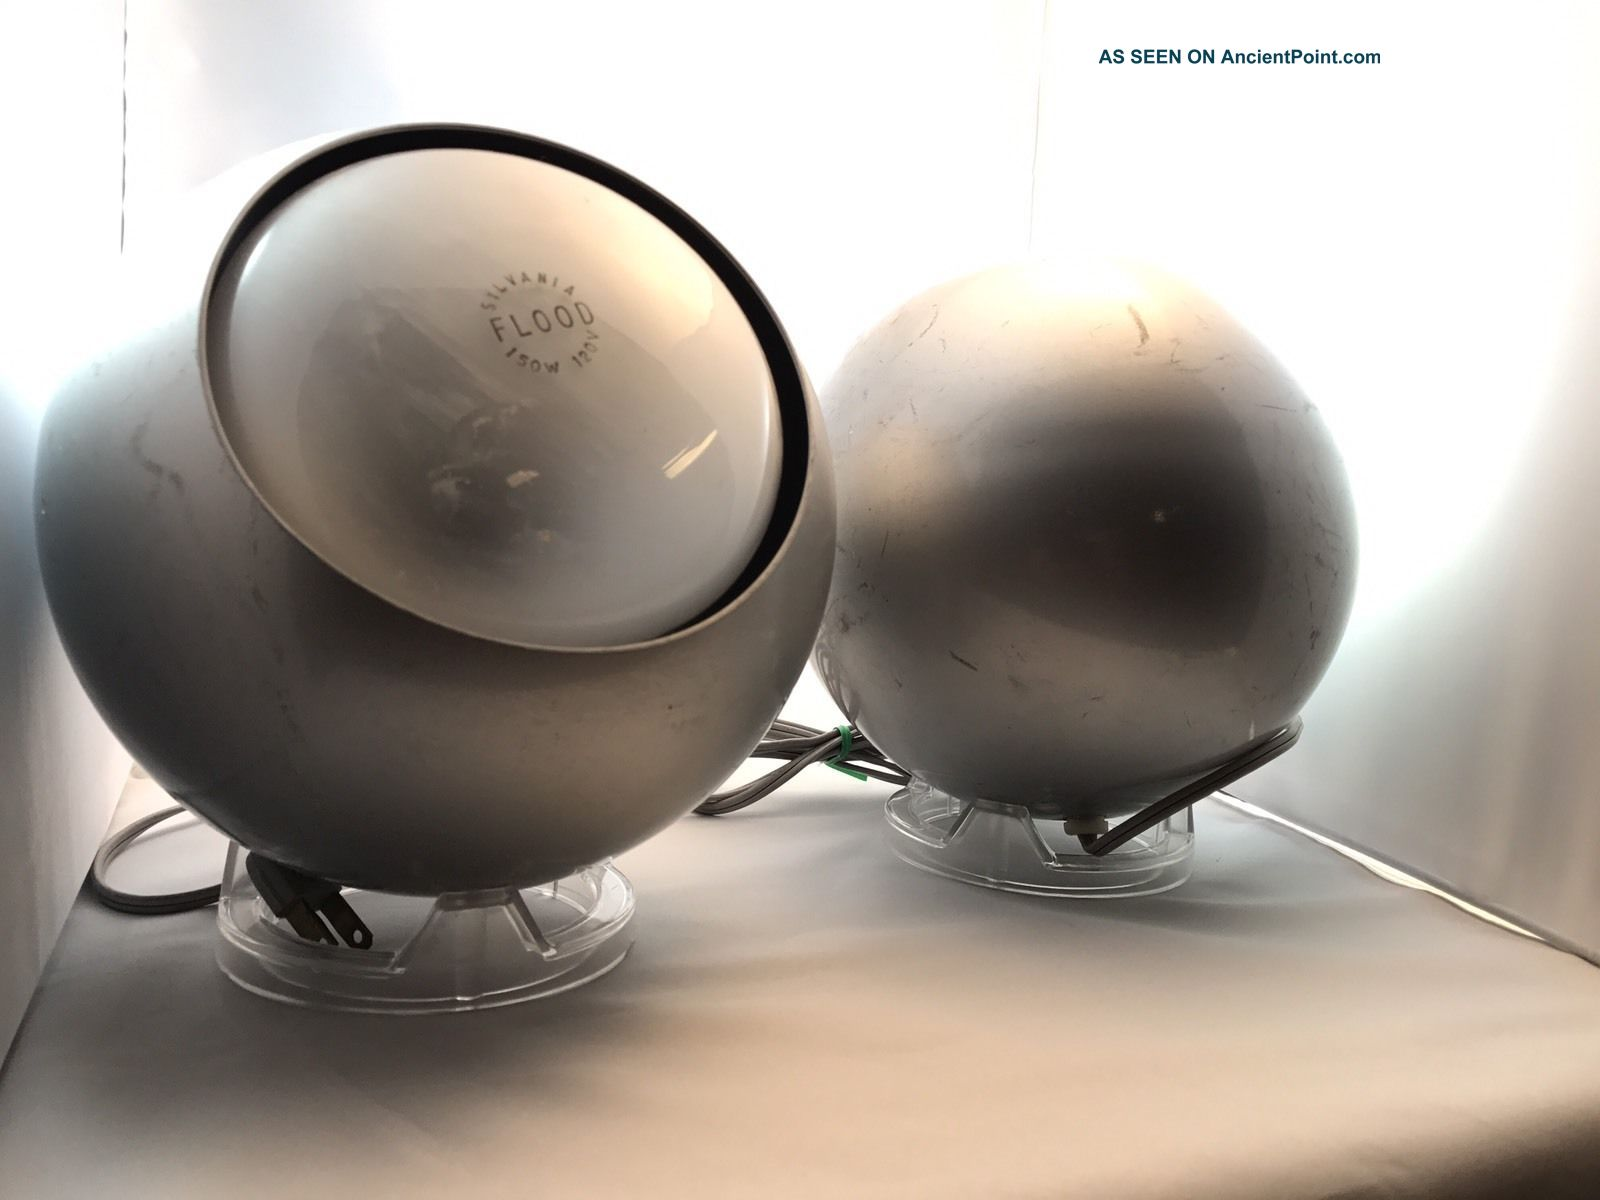 Vintage Pair Mcm 1960s Space Age Atomic Eyeball Table Lamps Eames Era Mid-Century Modernism photo